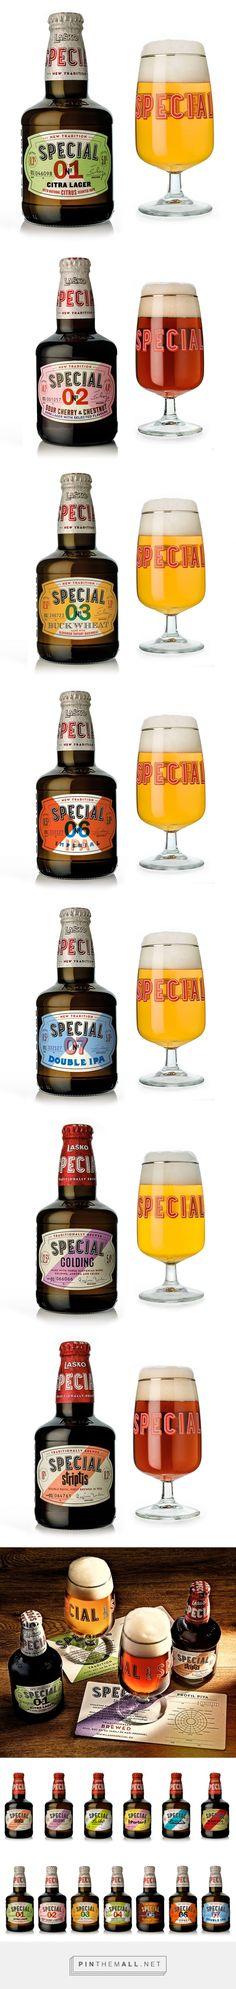 Laško Special | Oh Beautiful Beer